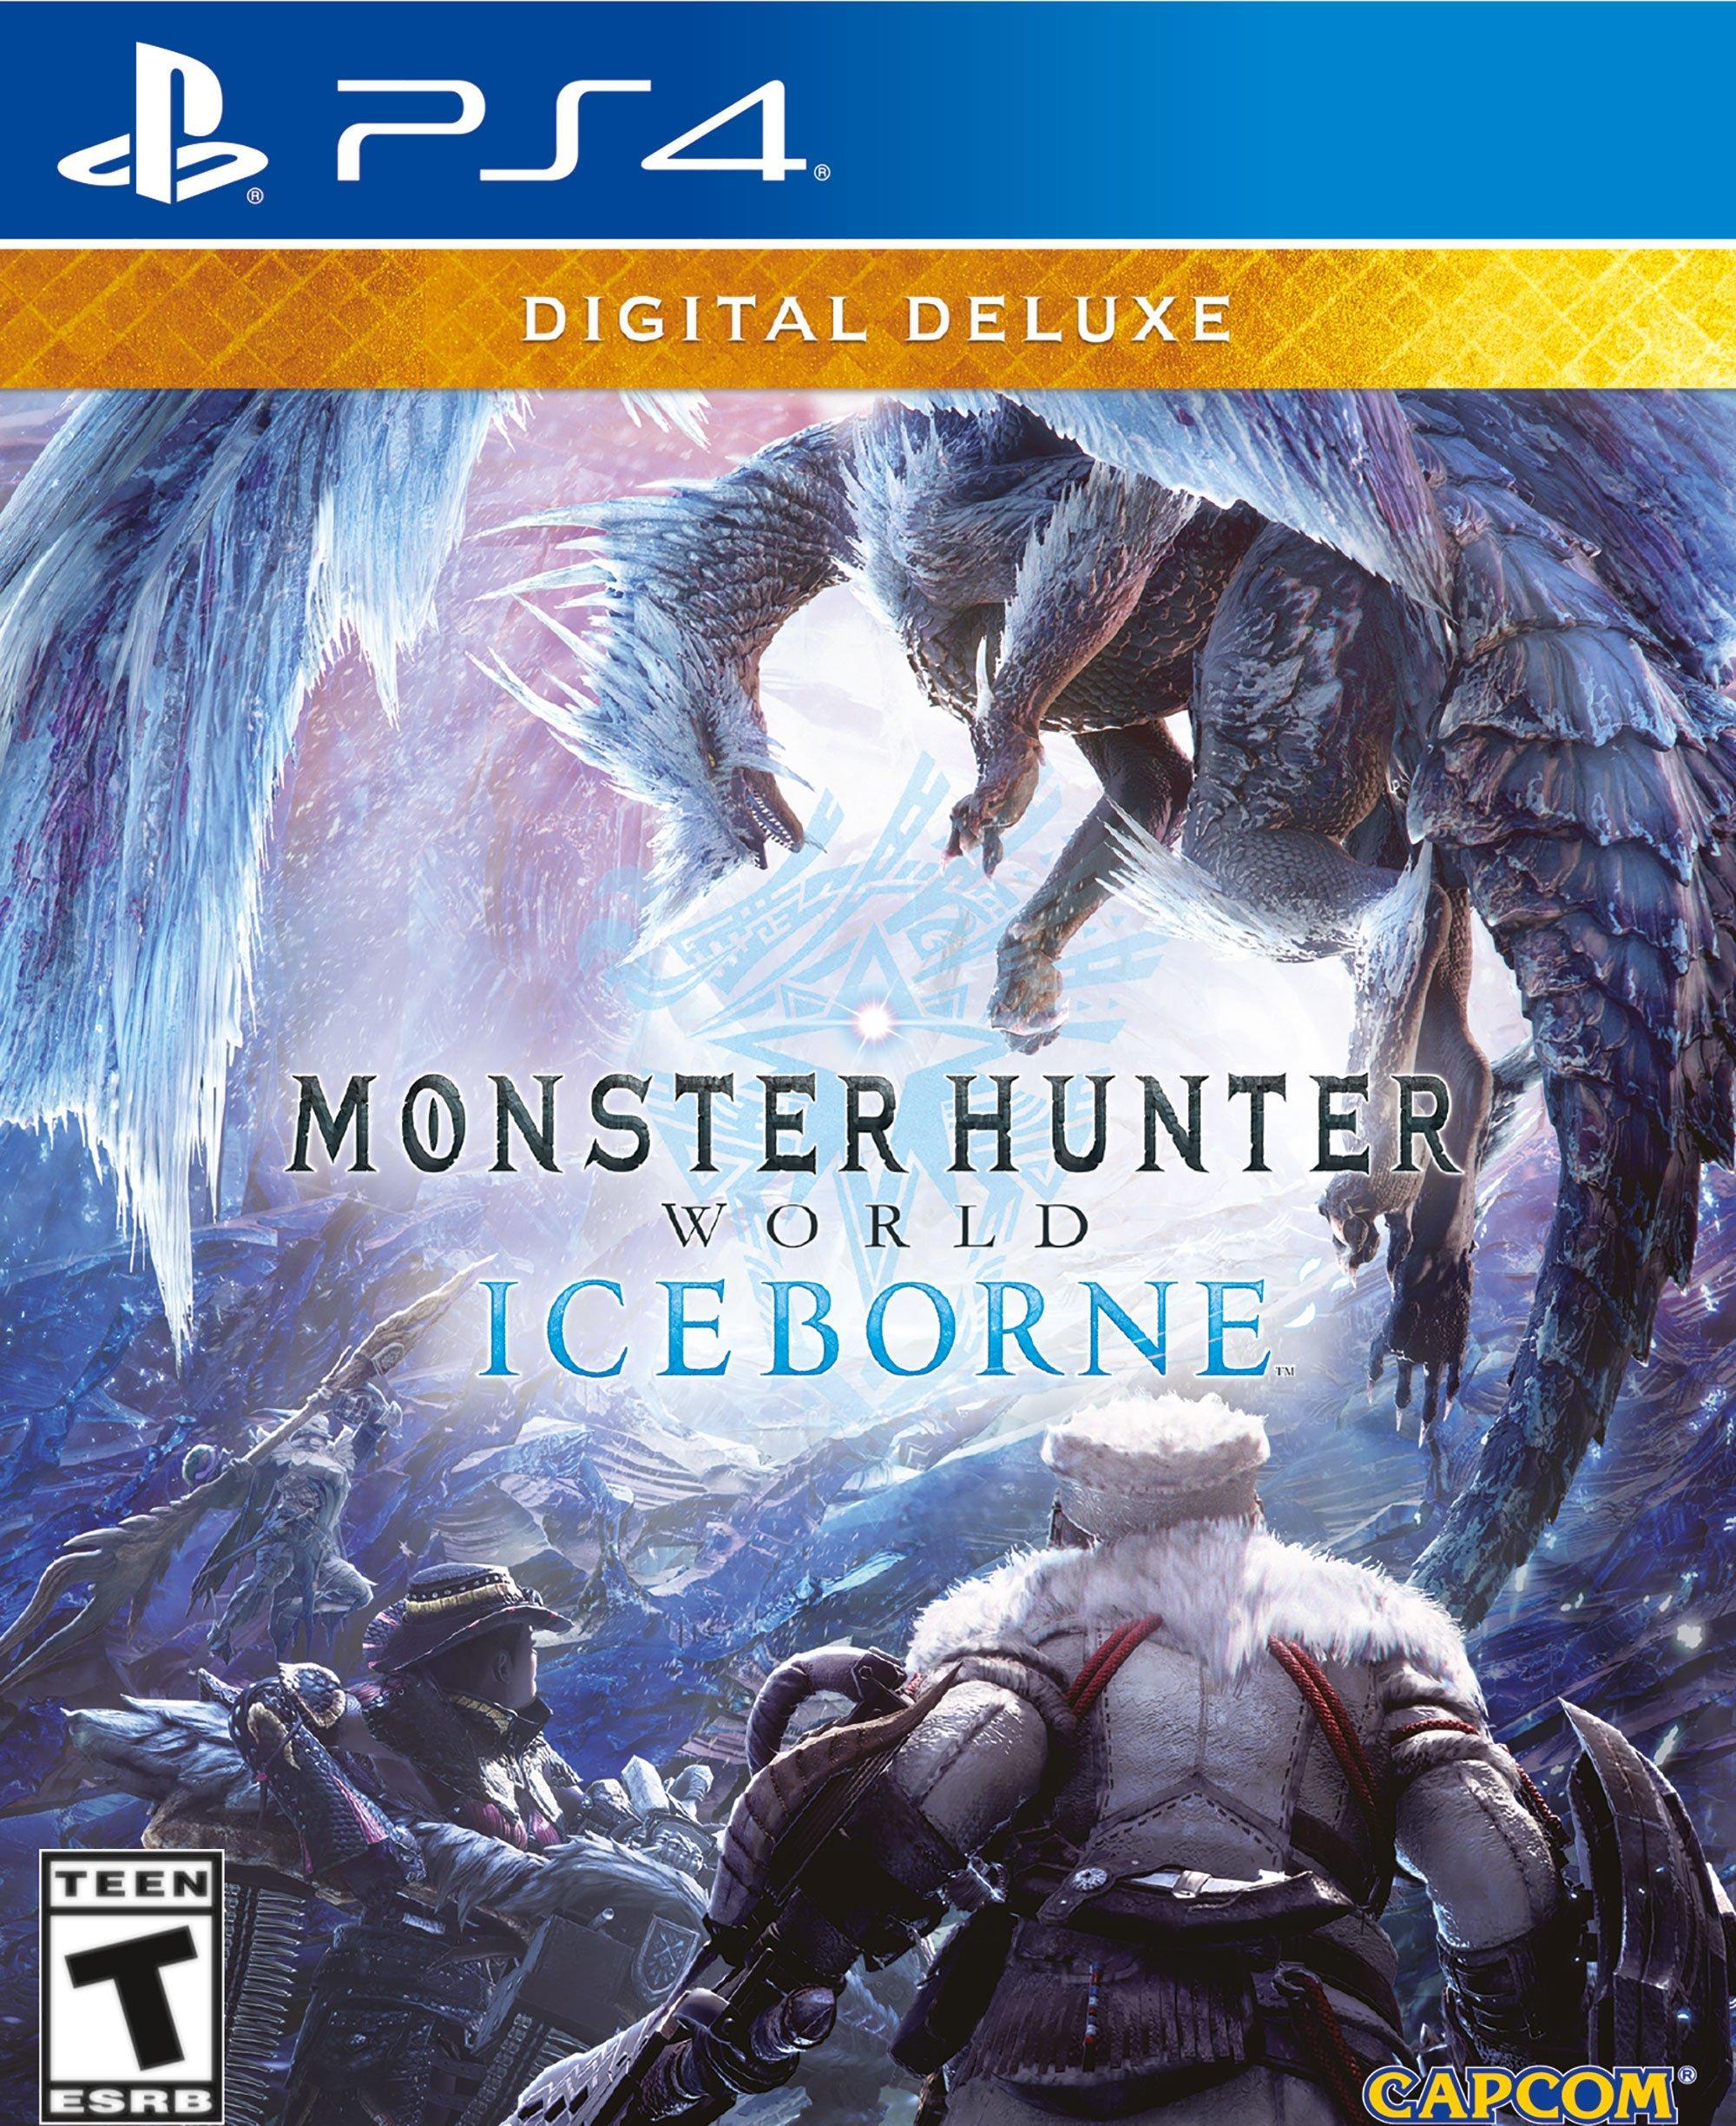 Monster Hunter World: Iceborne Deluxe Edition | PlayStation 4 | GameStop